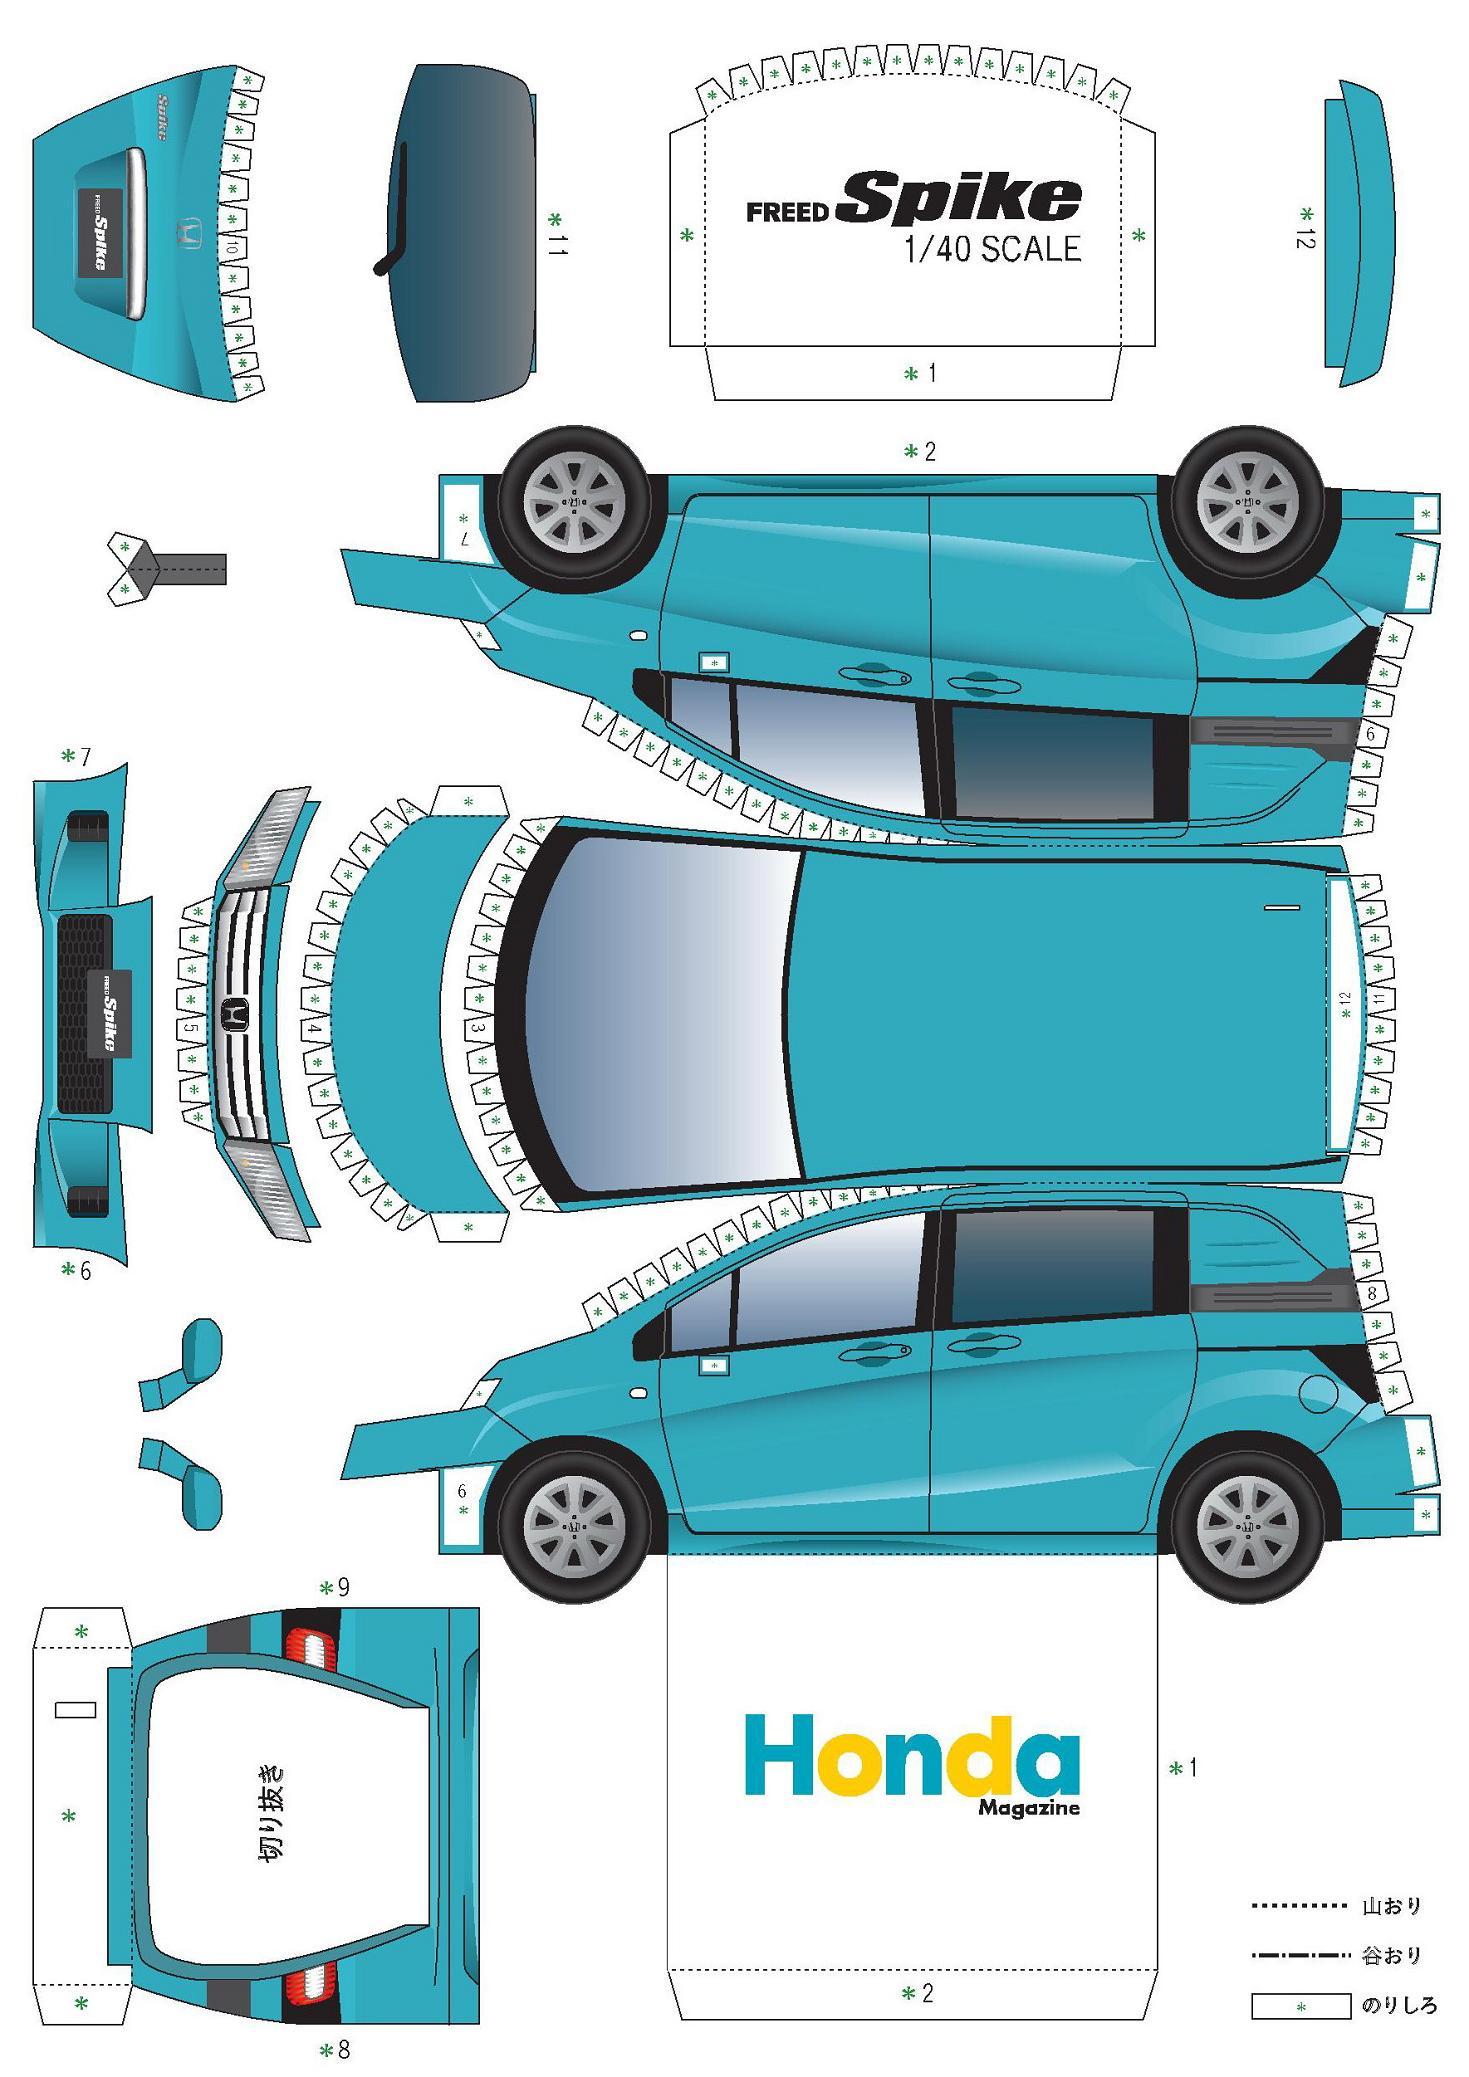 Honda Papercraft